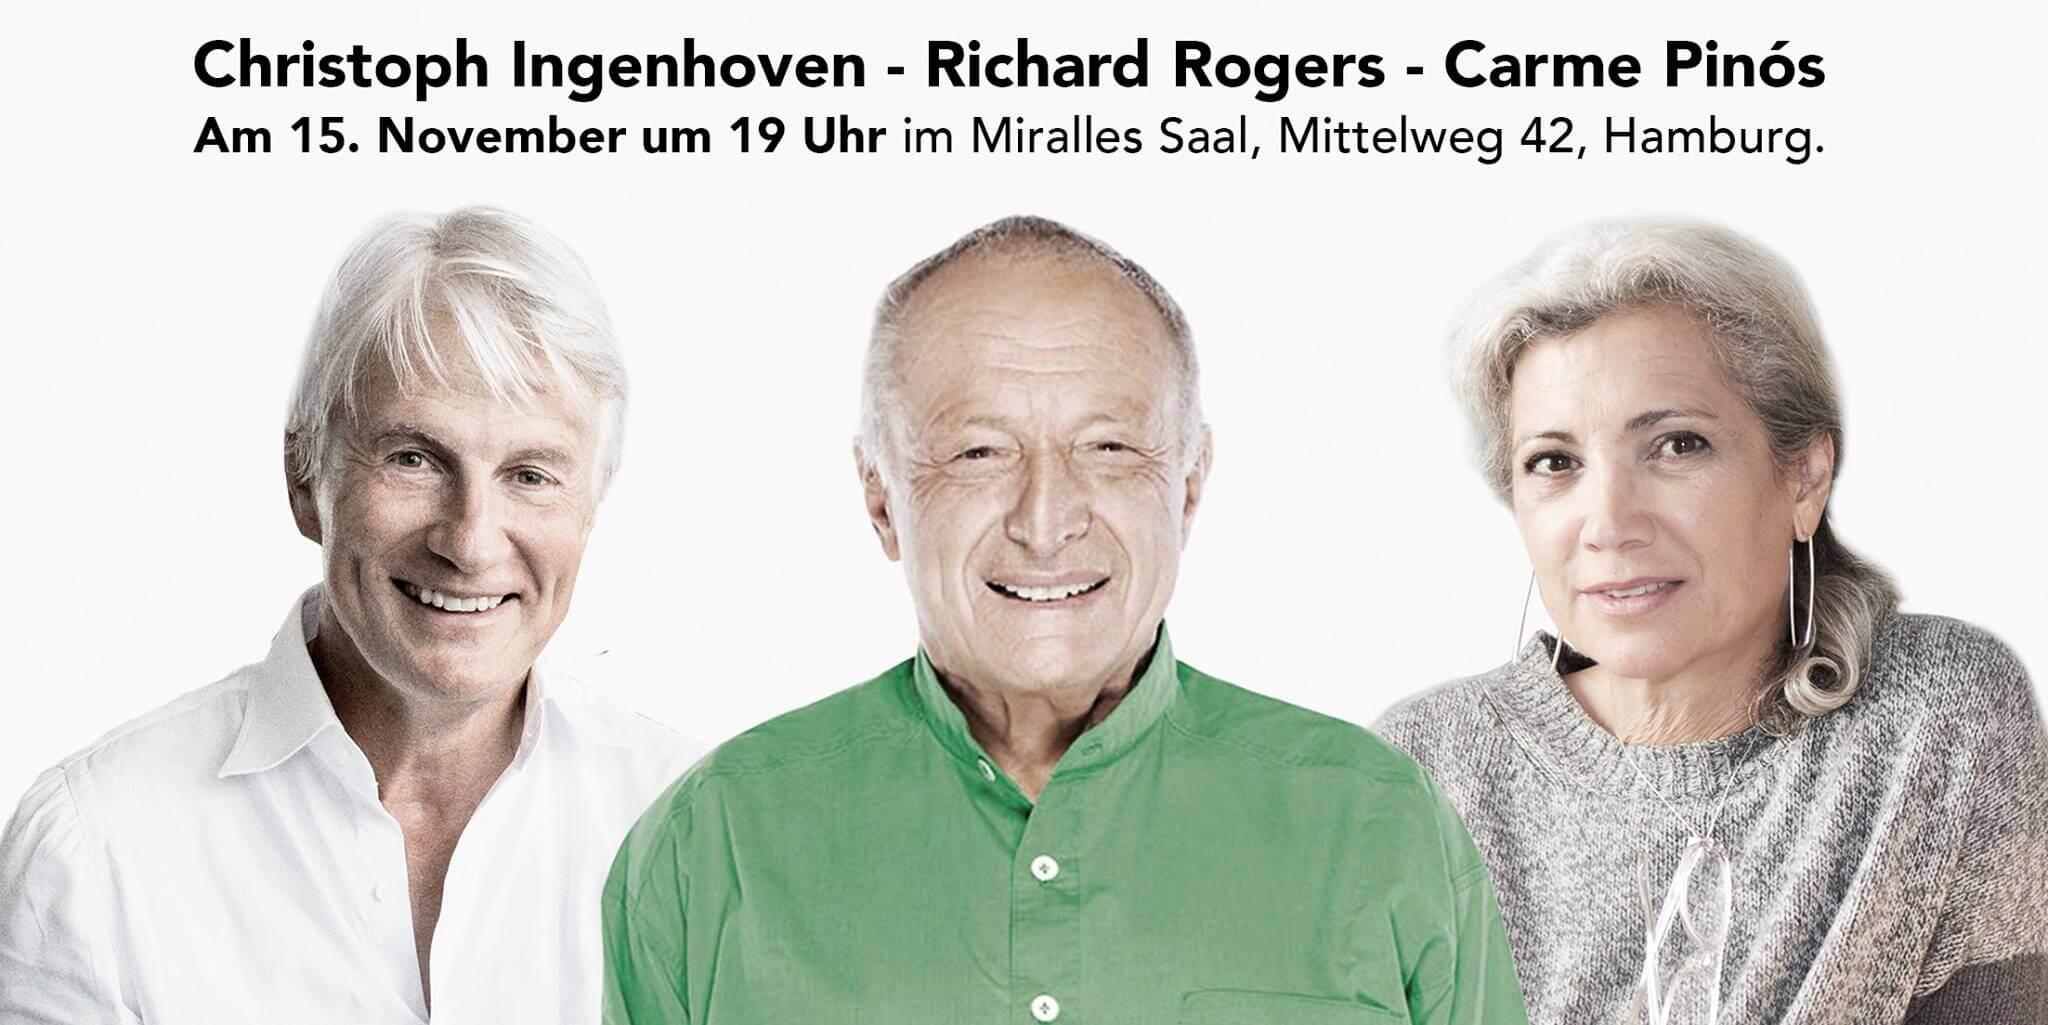 Pinós, Ingenhoven, Rogers